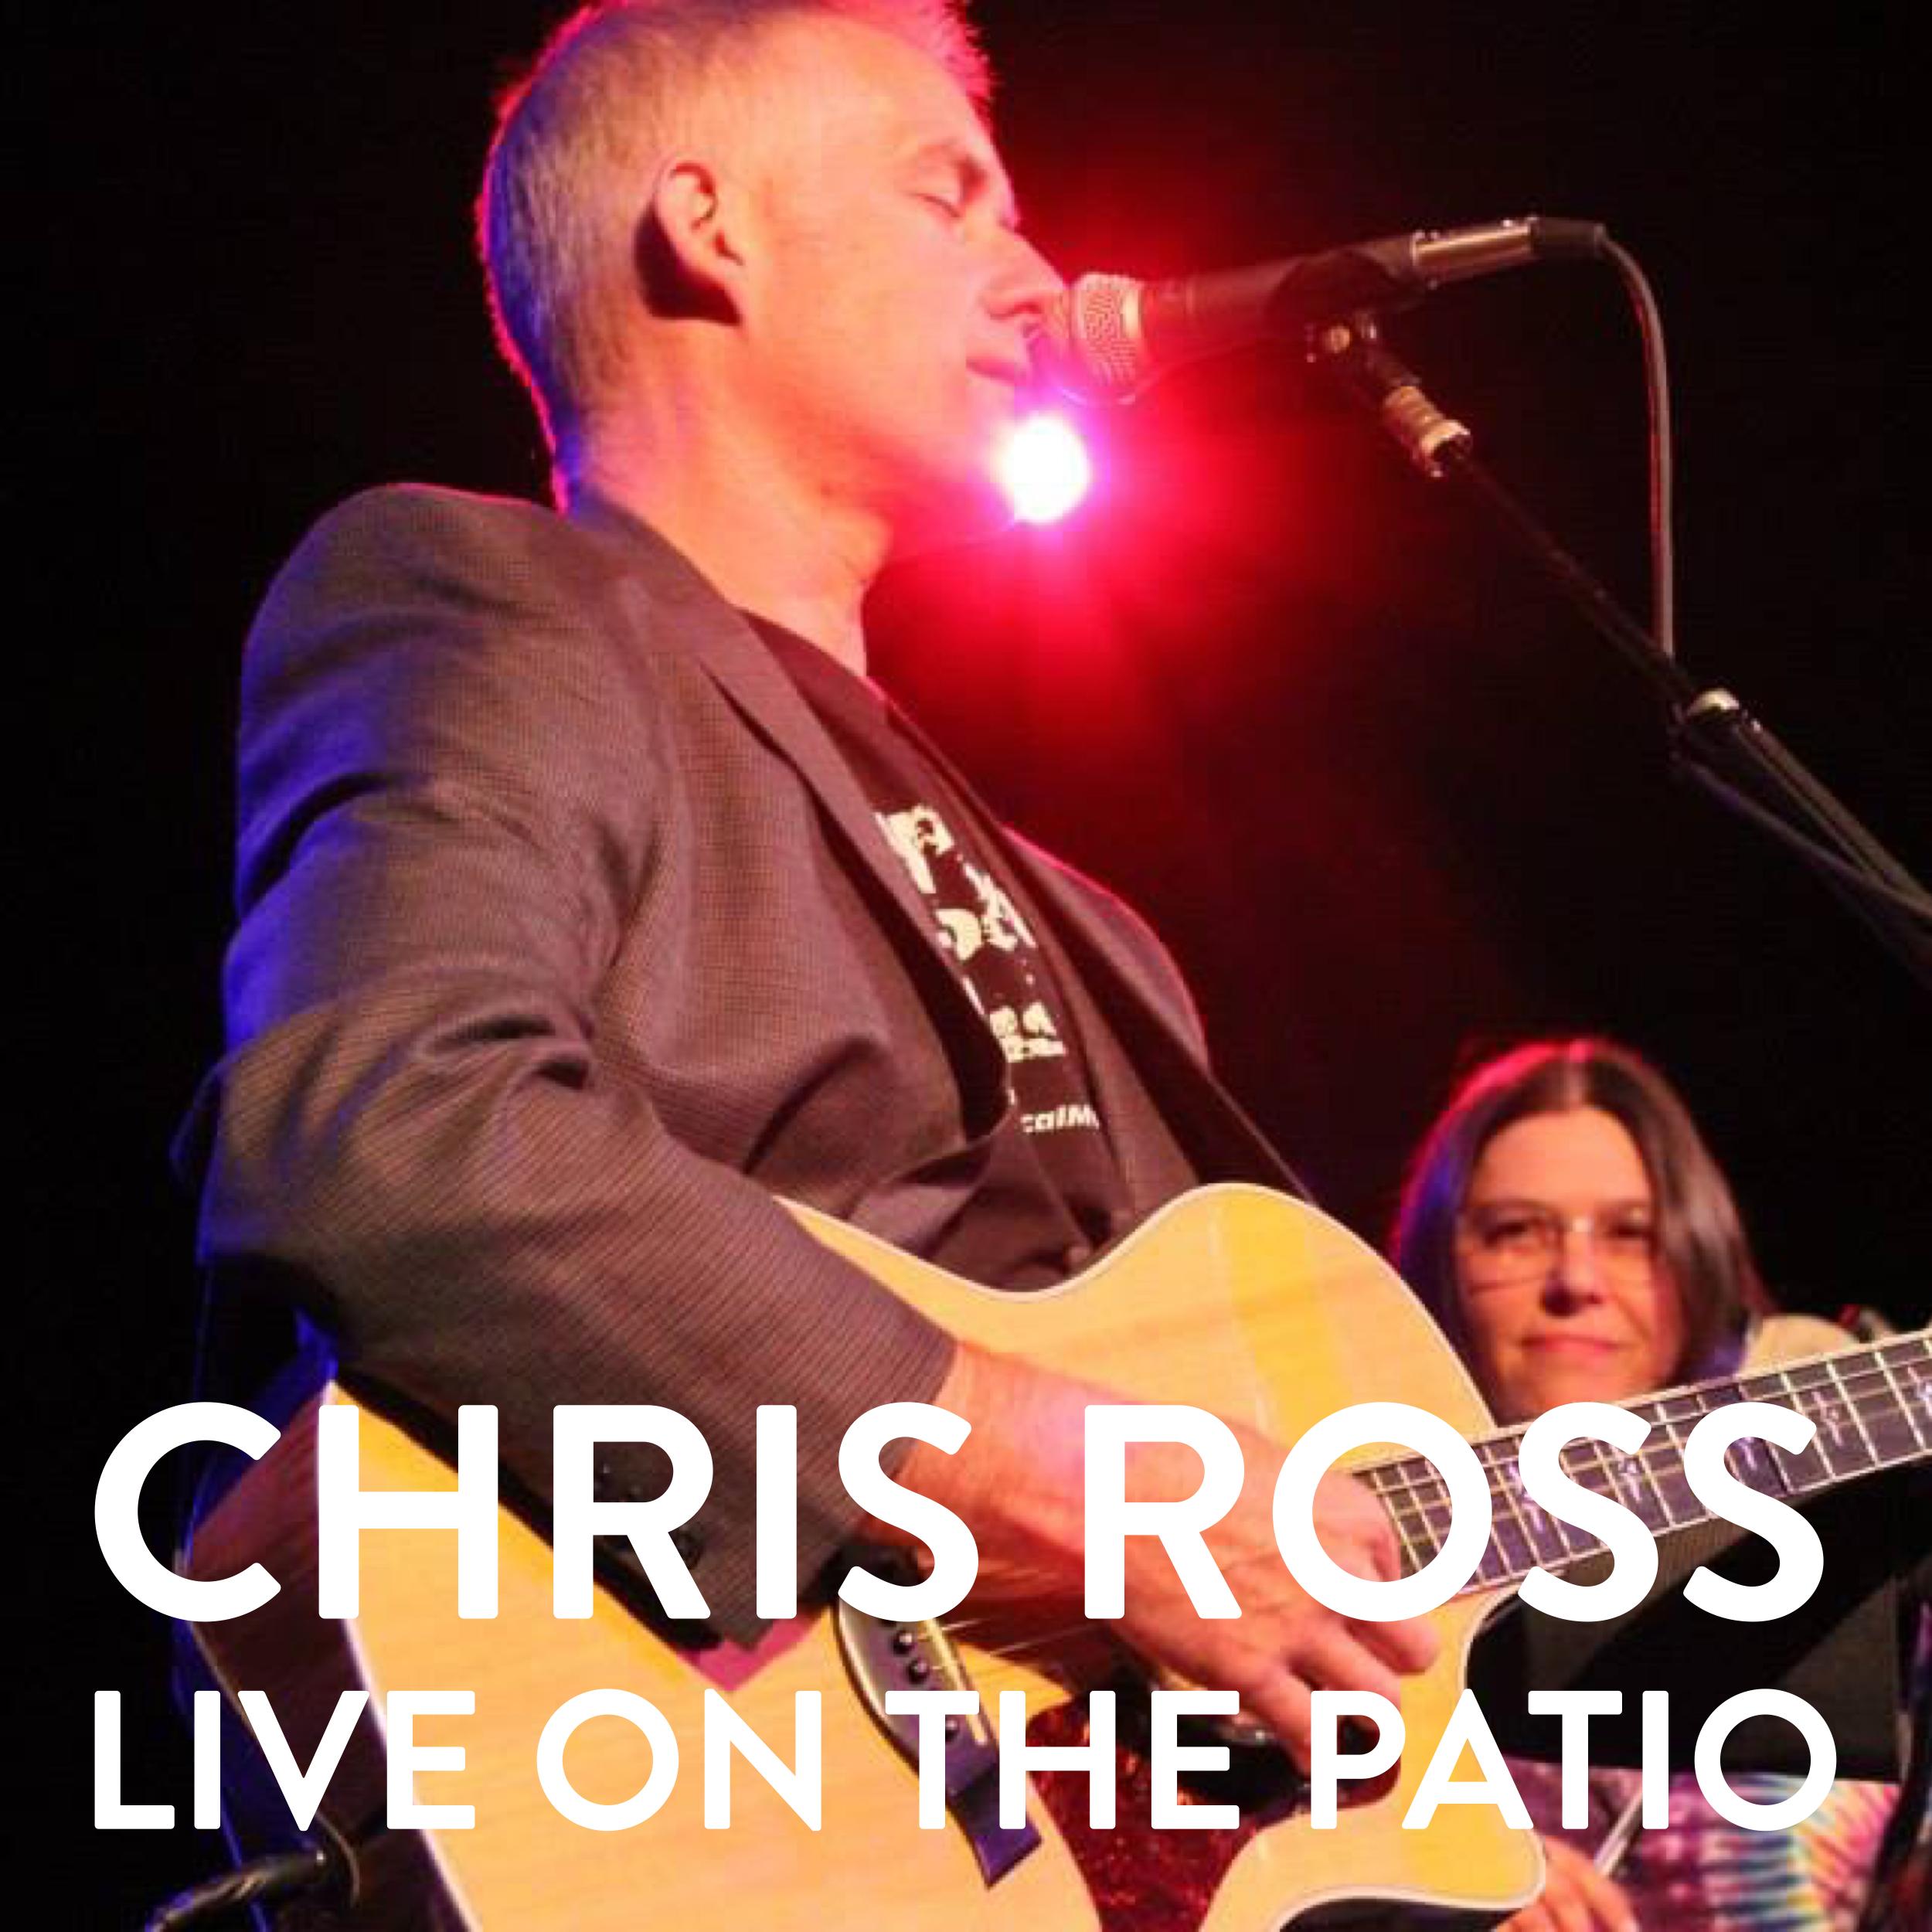 Chris Ross on the patio 2.jpg